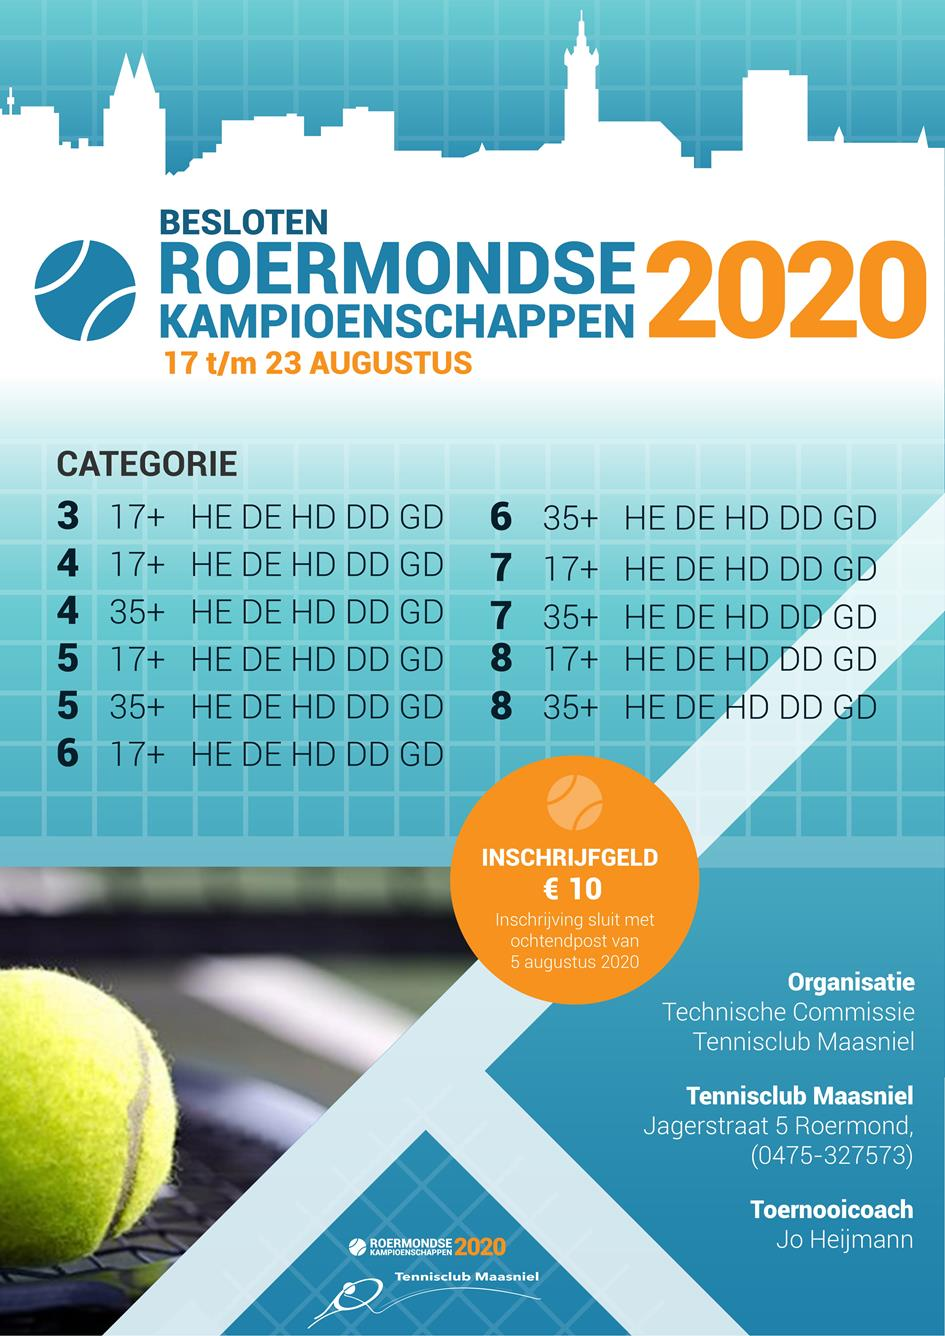 Roermondsekampioenschappen-2020-a2-1.jpg